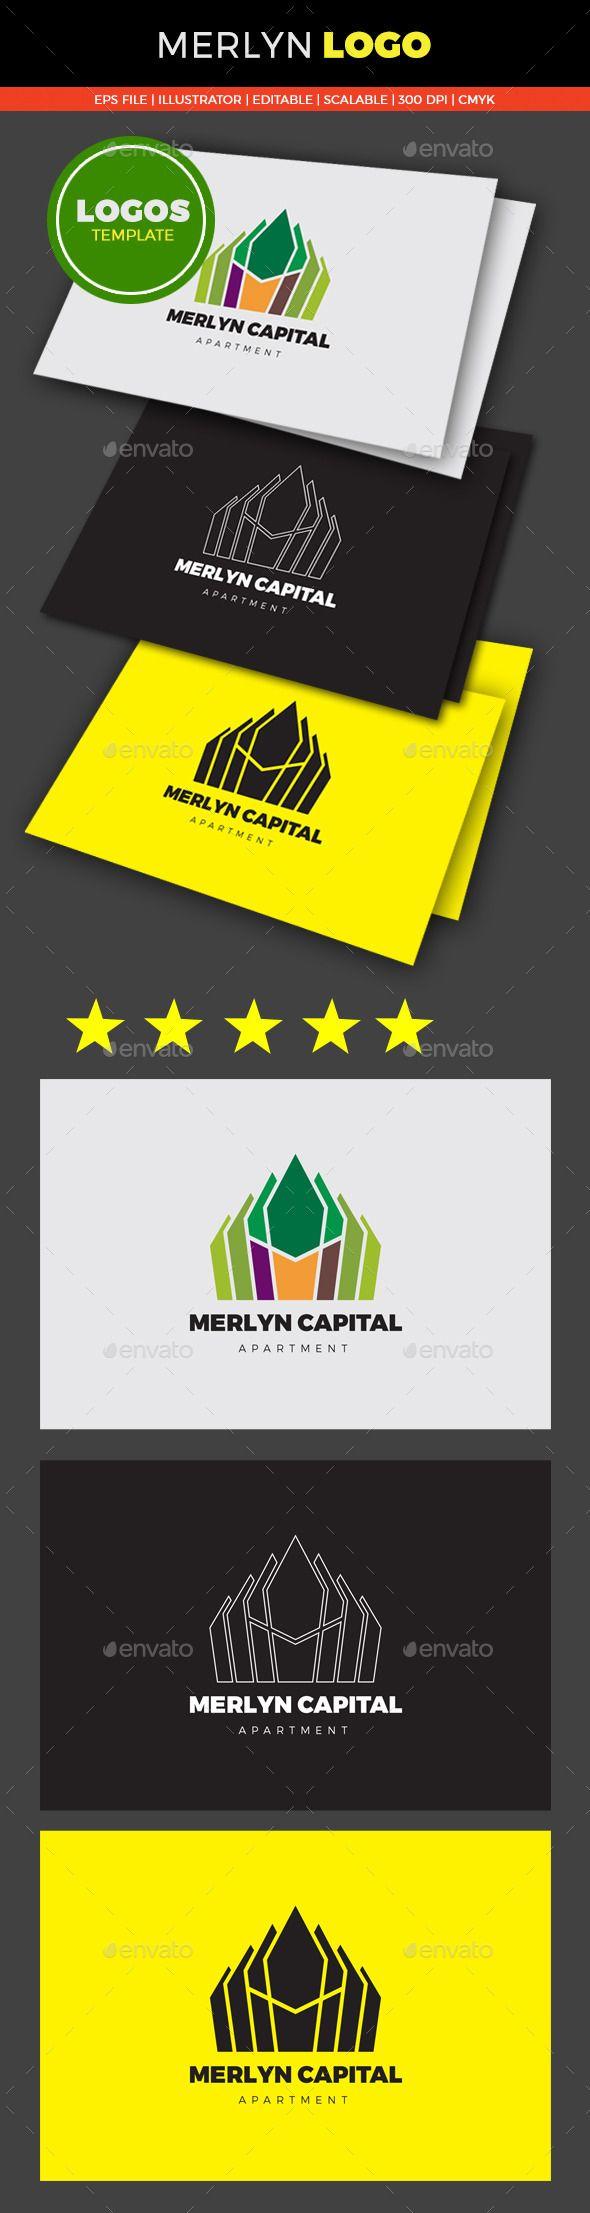 Merlyn Park Logo